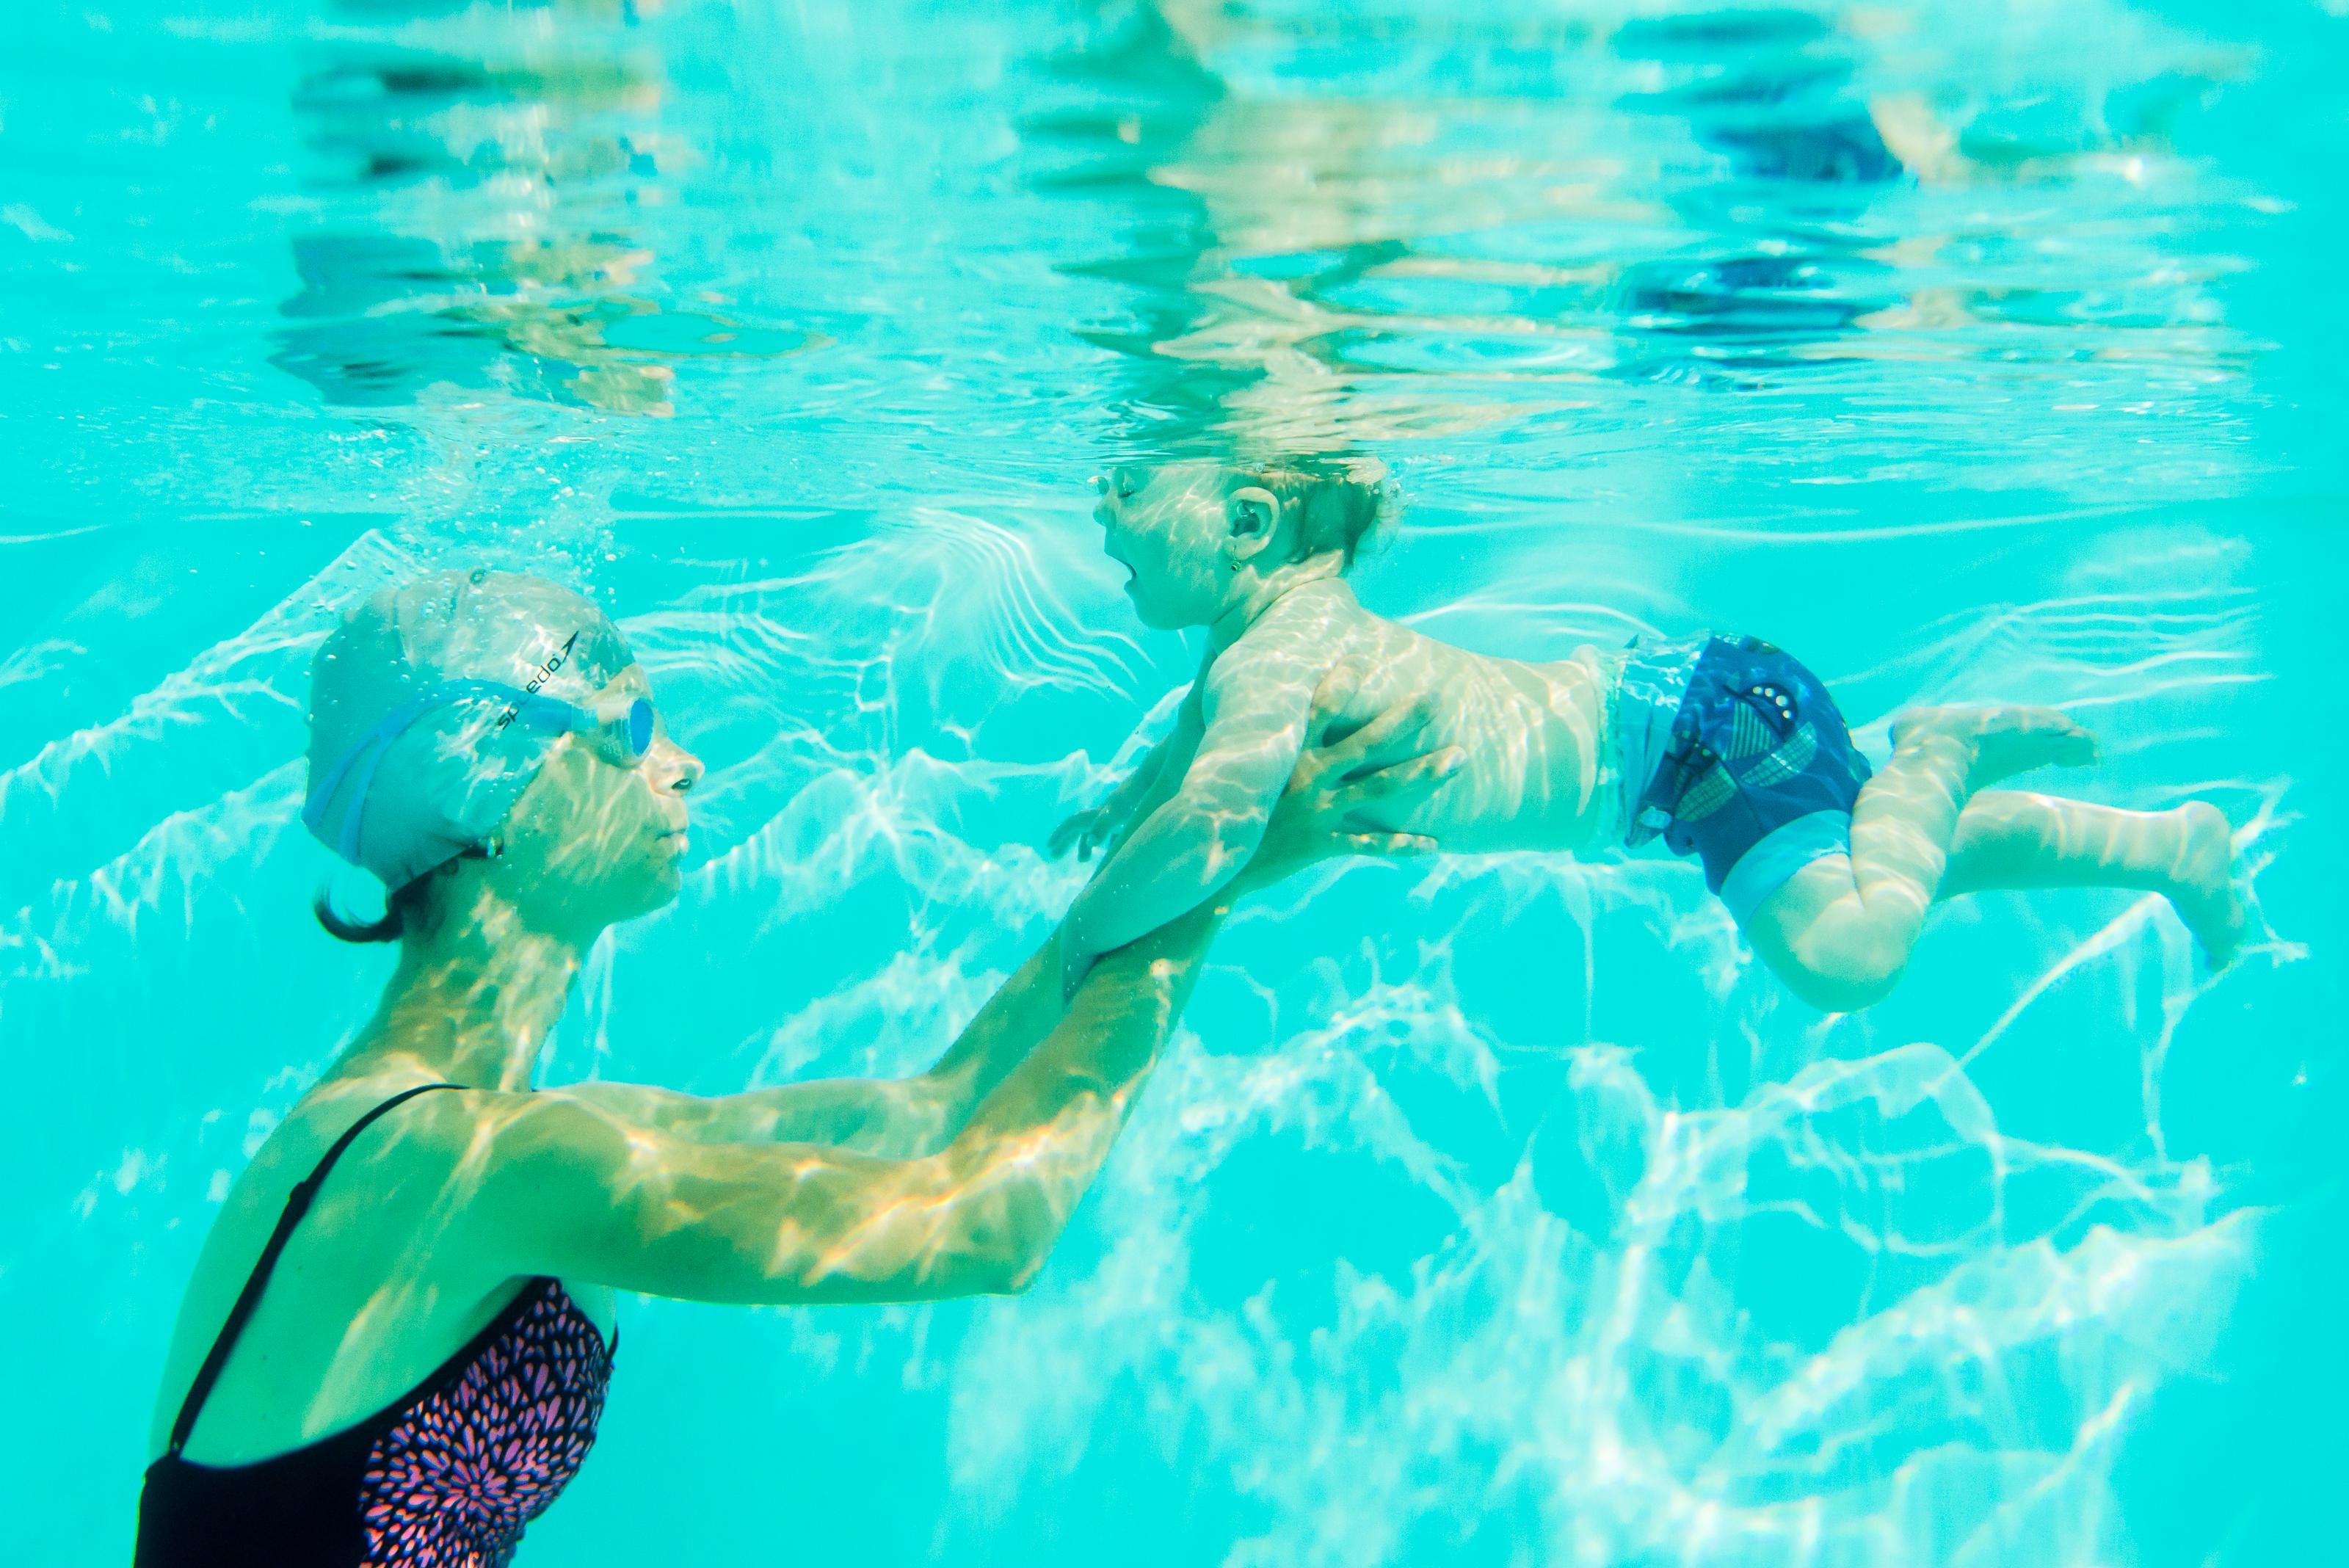 Plavanie pod vodou